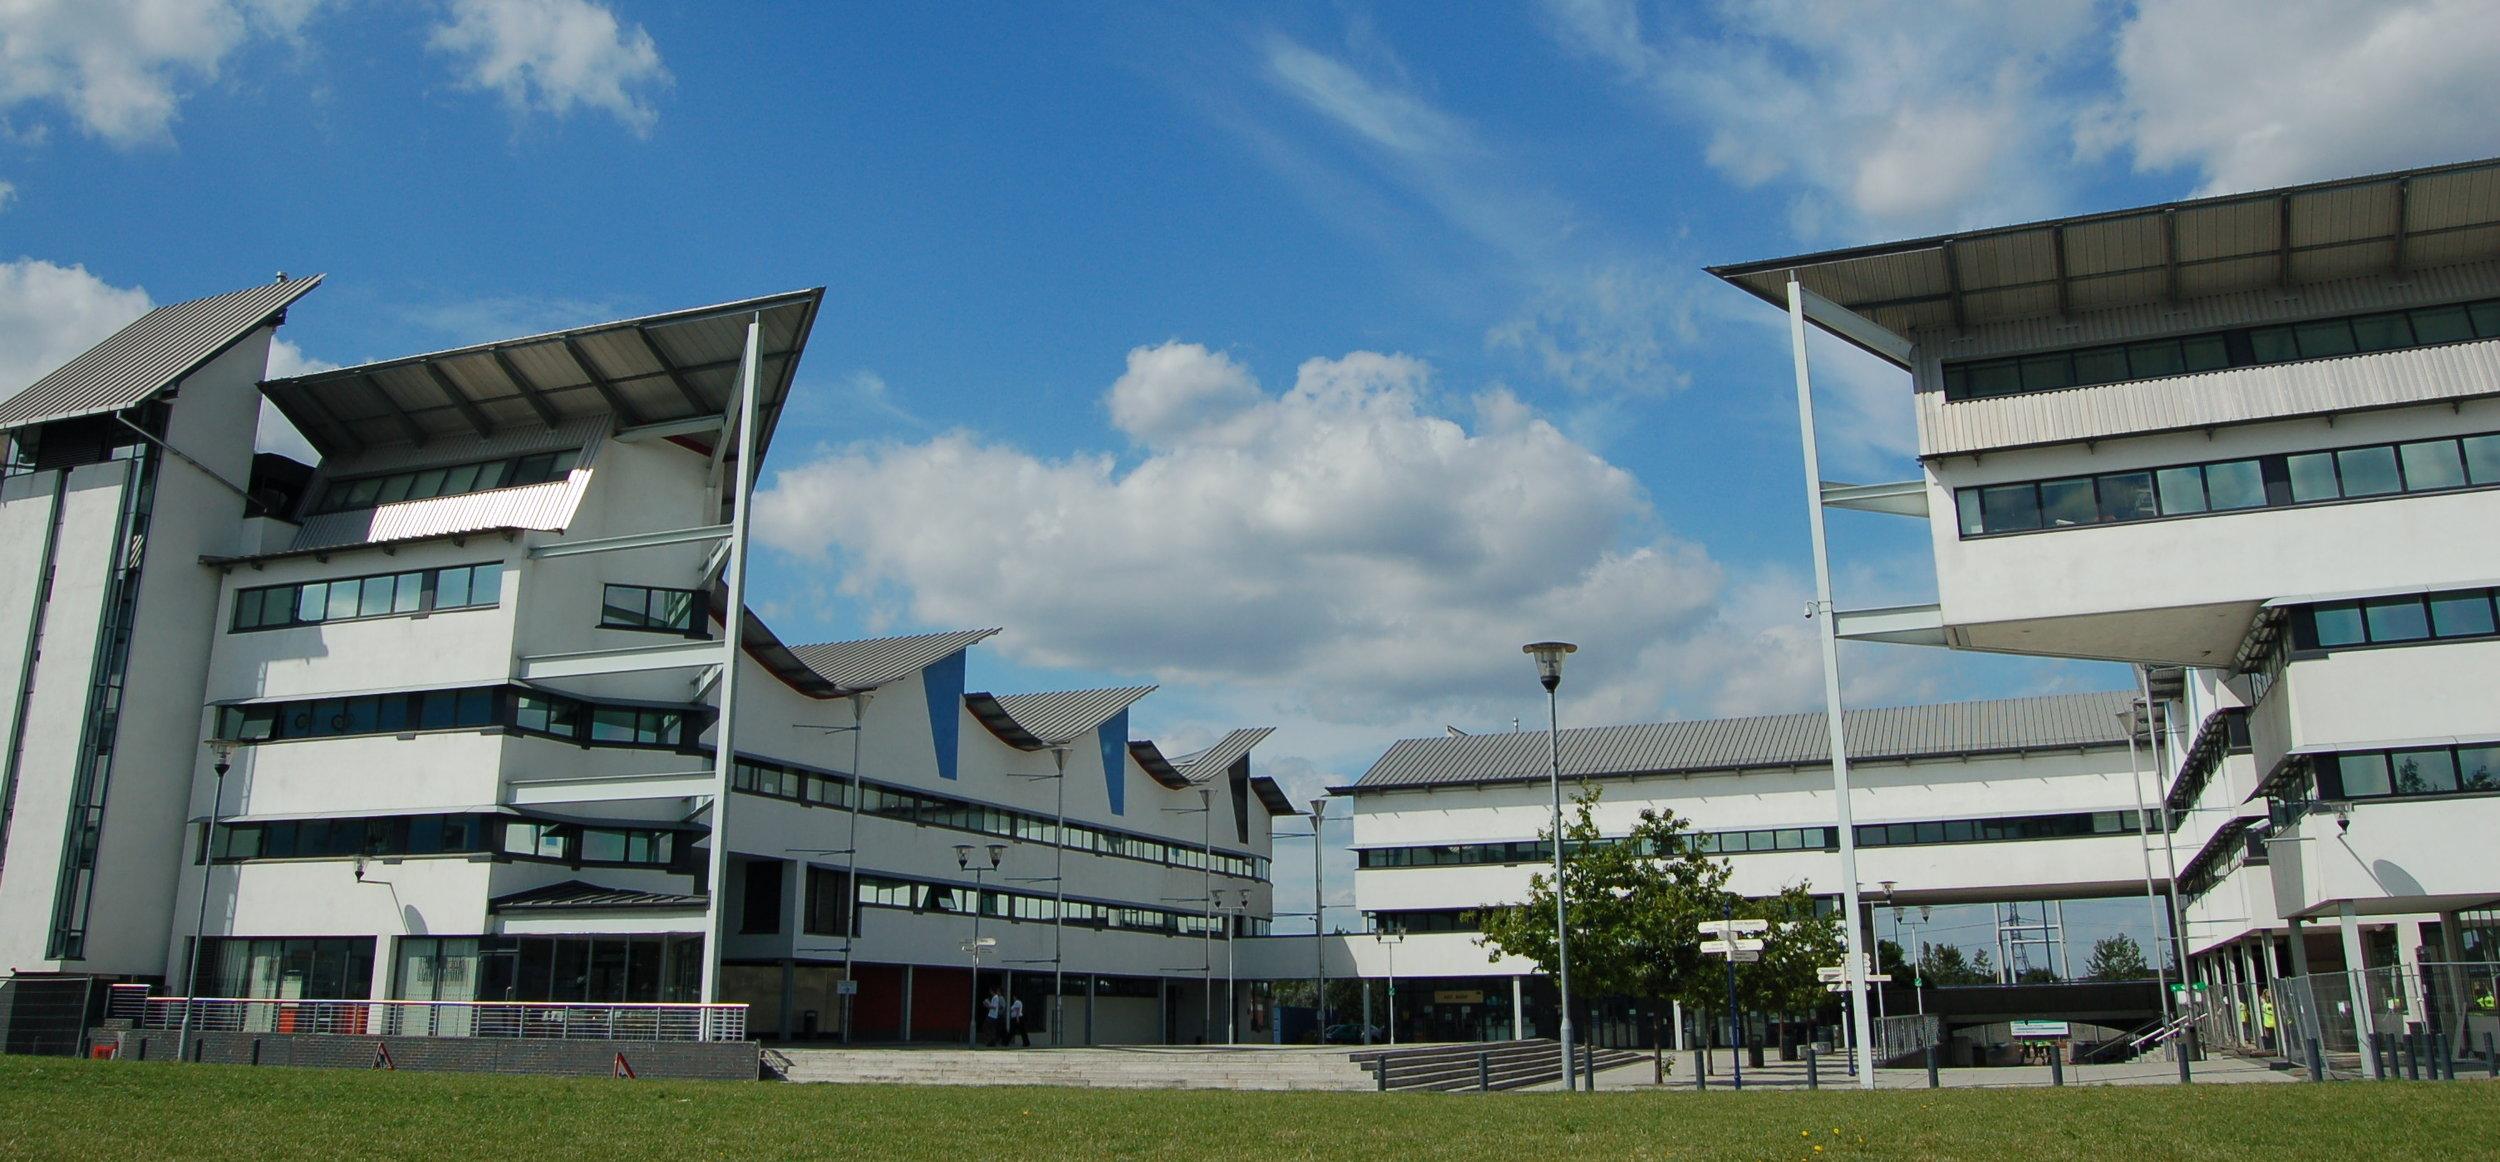 UEL_Docklands_Campus-e1497559429308.jpg